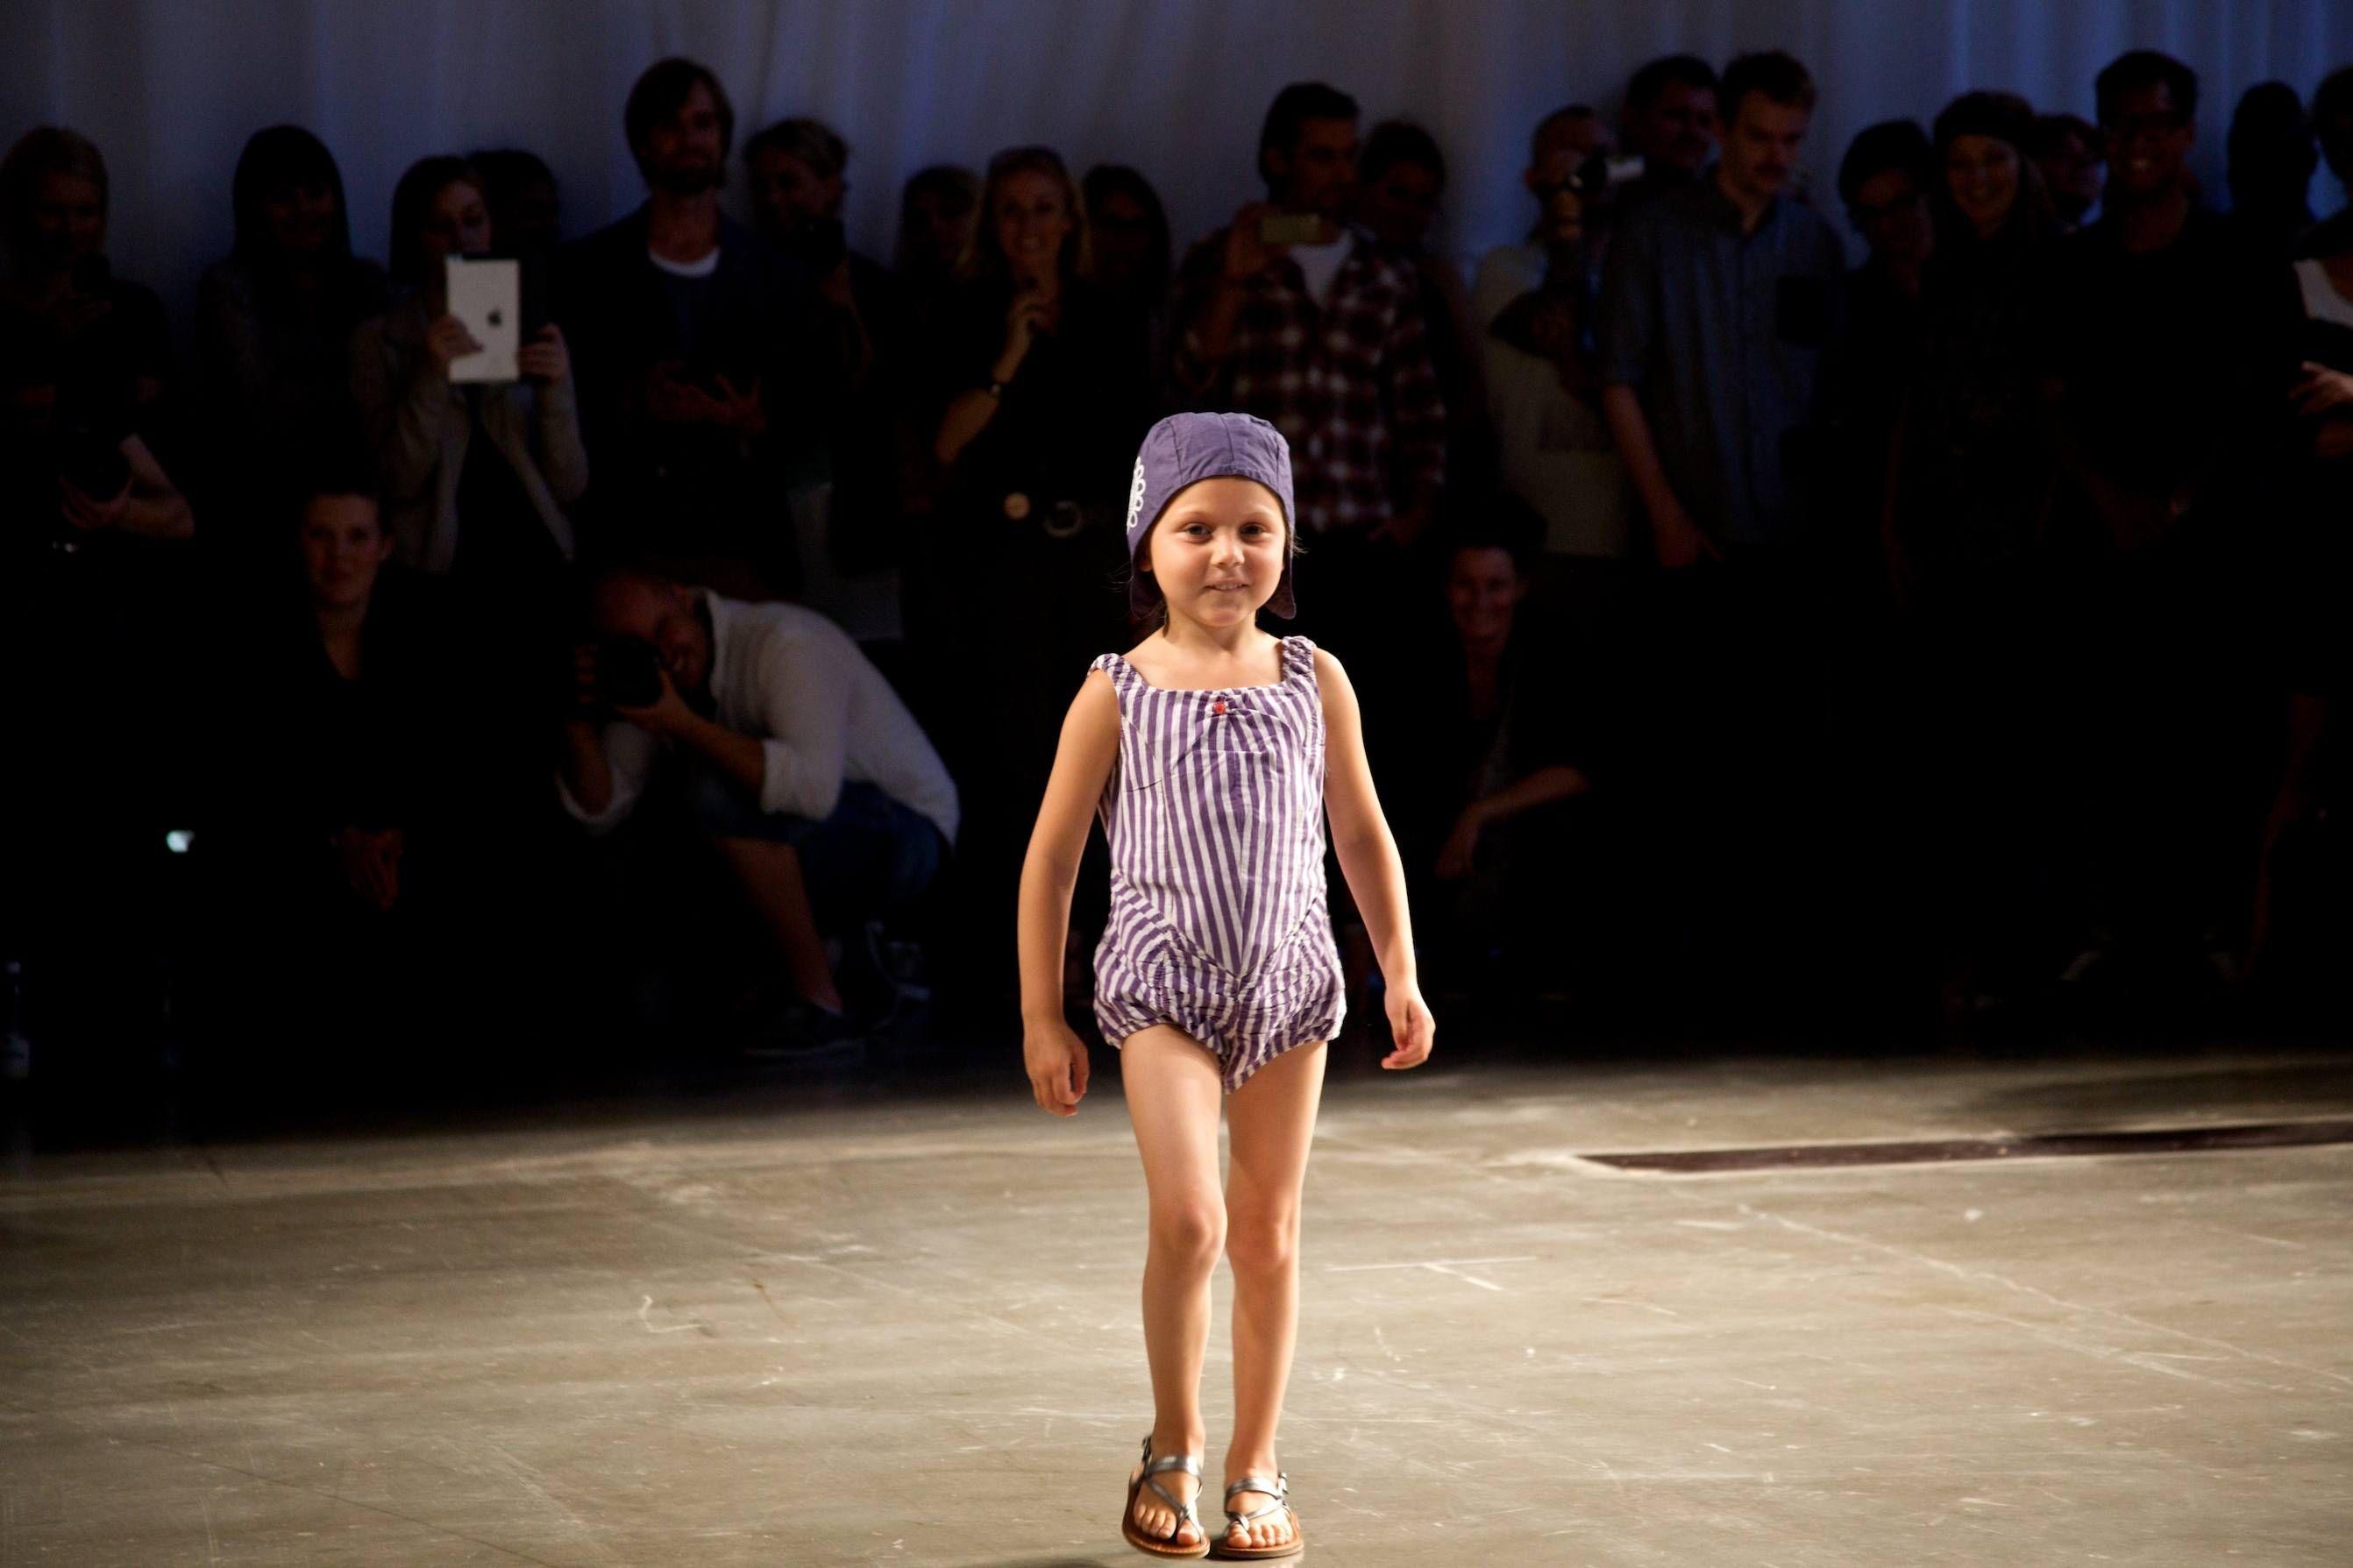 Wovenplay cotton playsuit at CPH Kids fashion show for summer 2013 #kidsfashion #childrensfashion